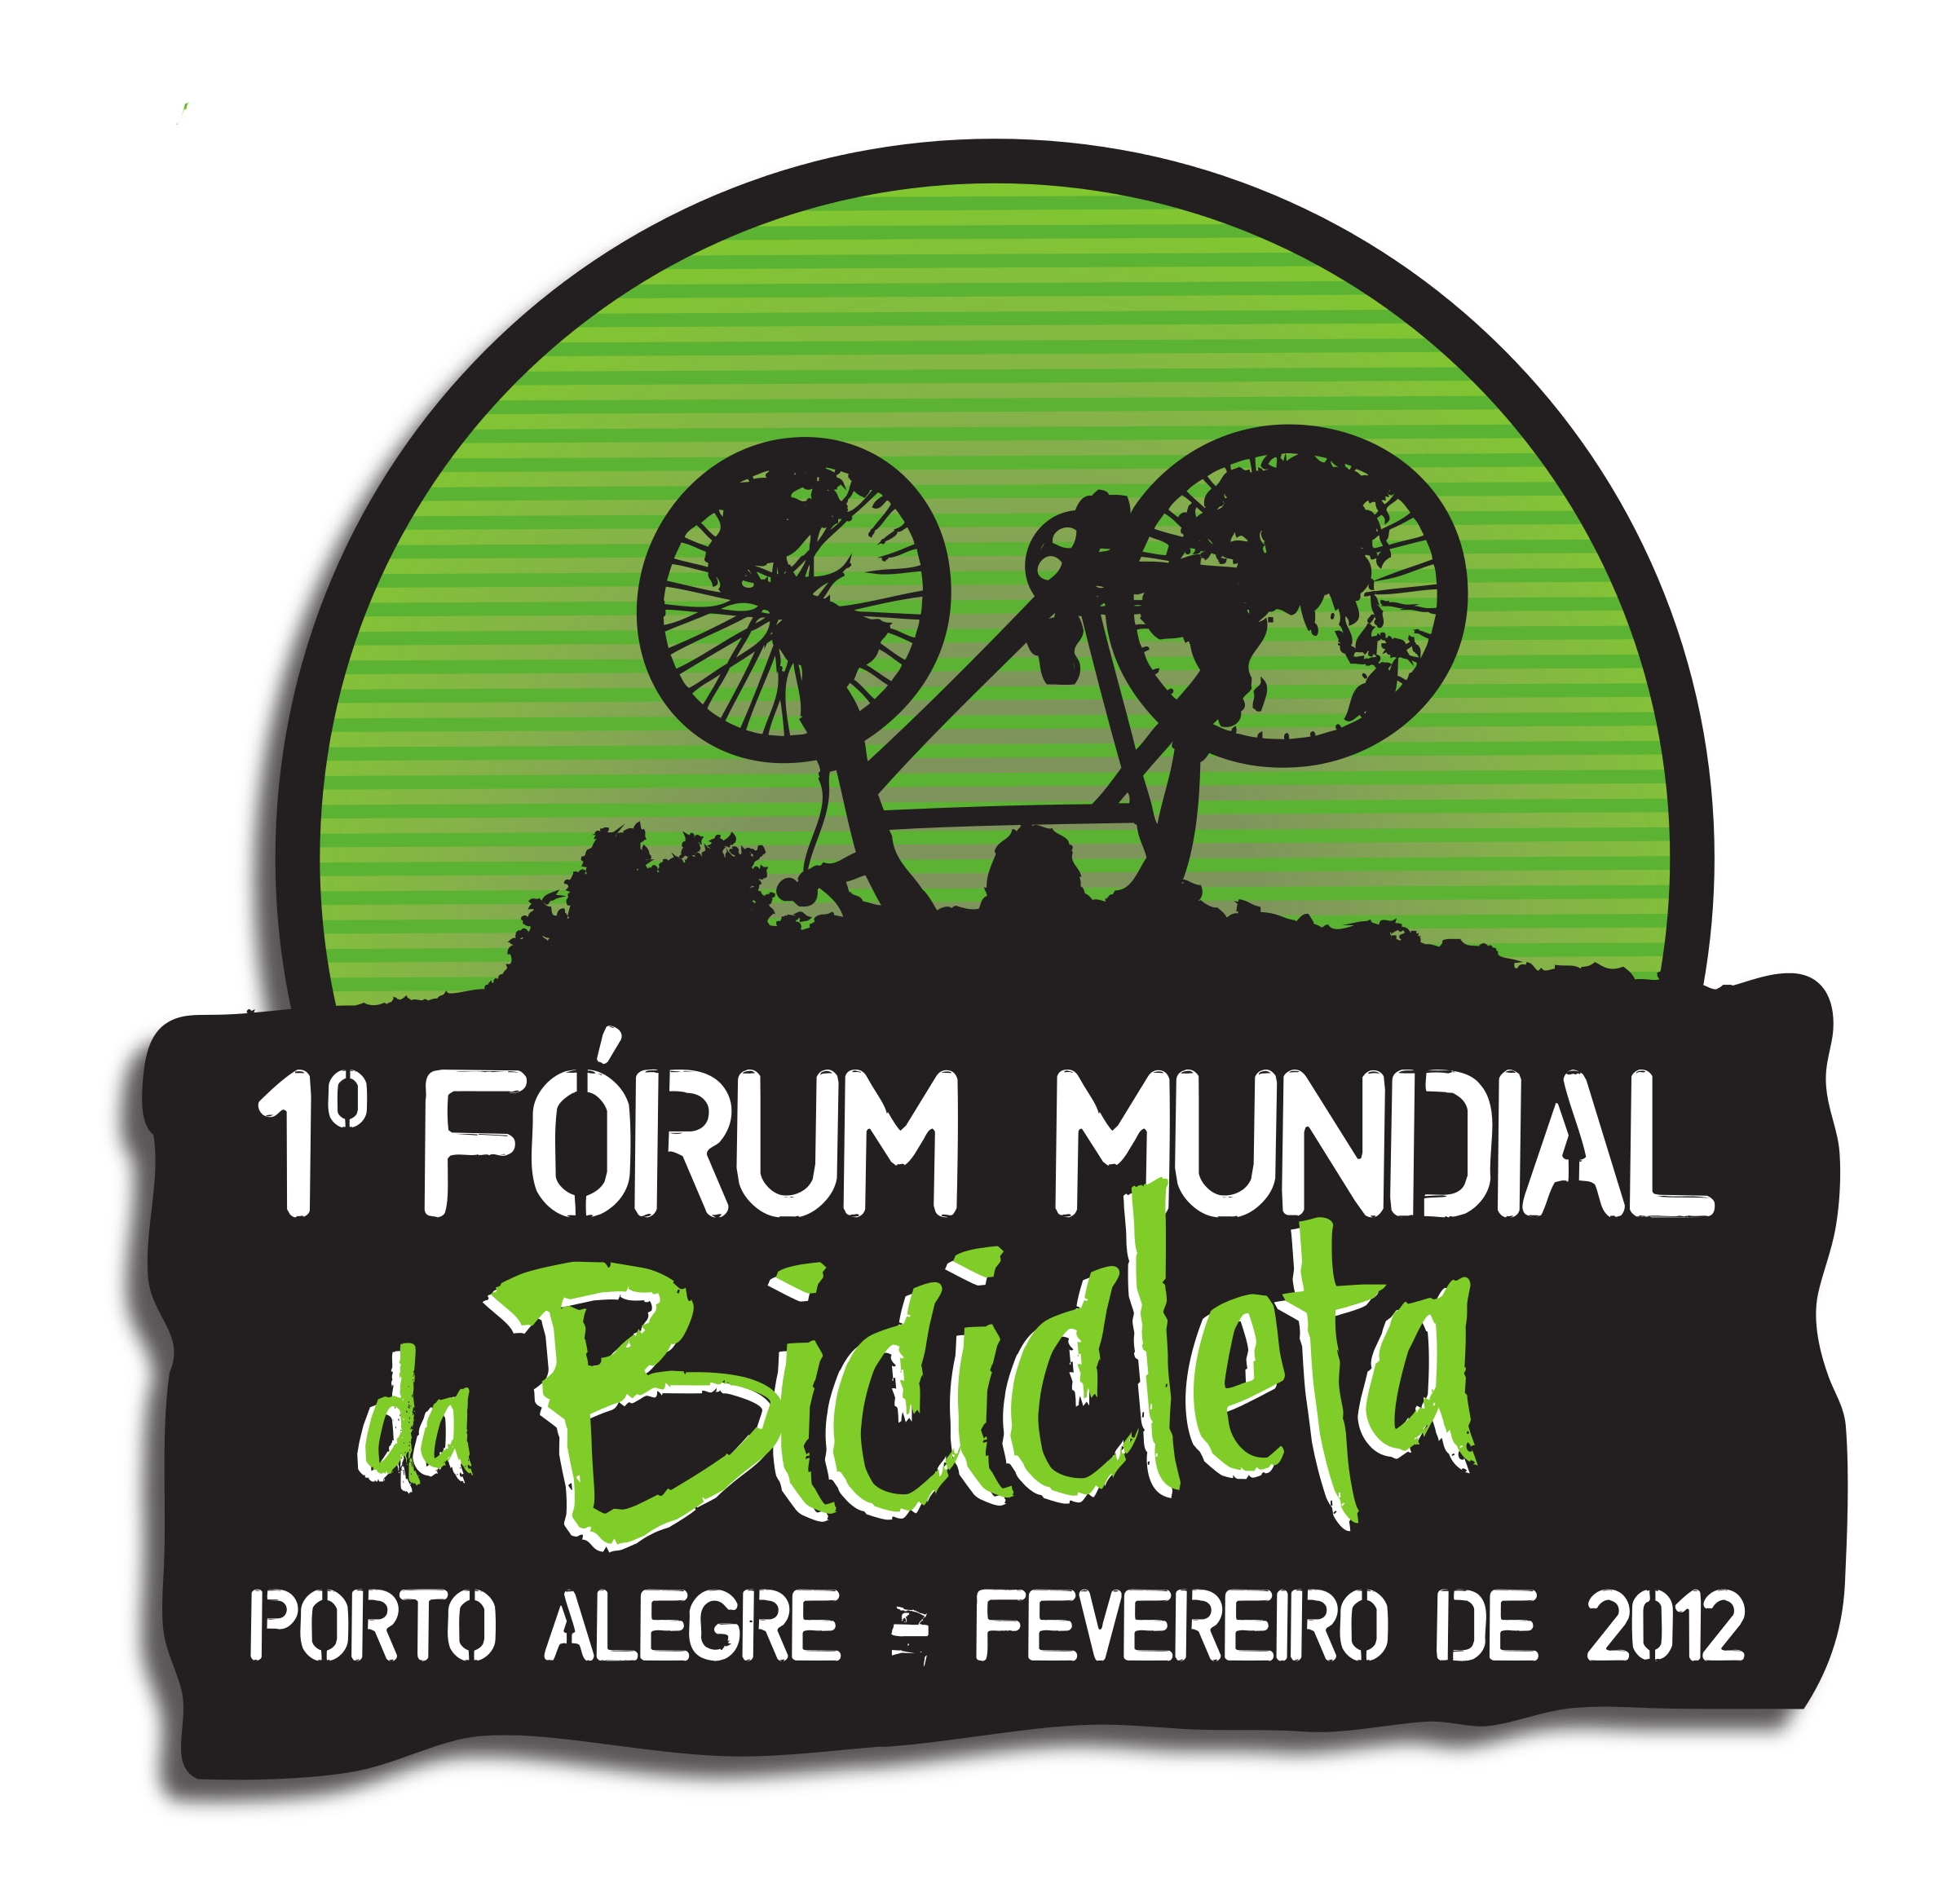 1º forum mundial da bicicleta